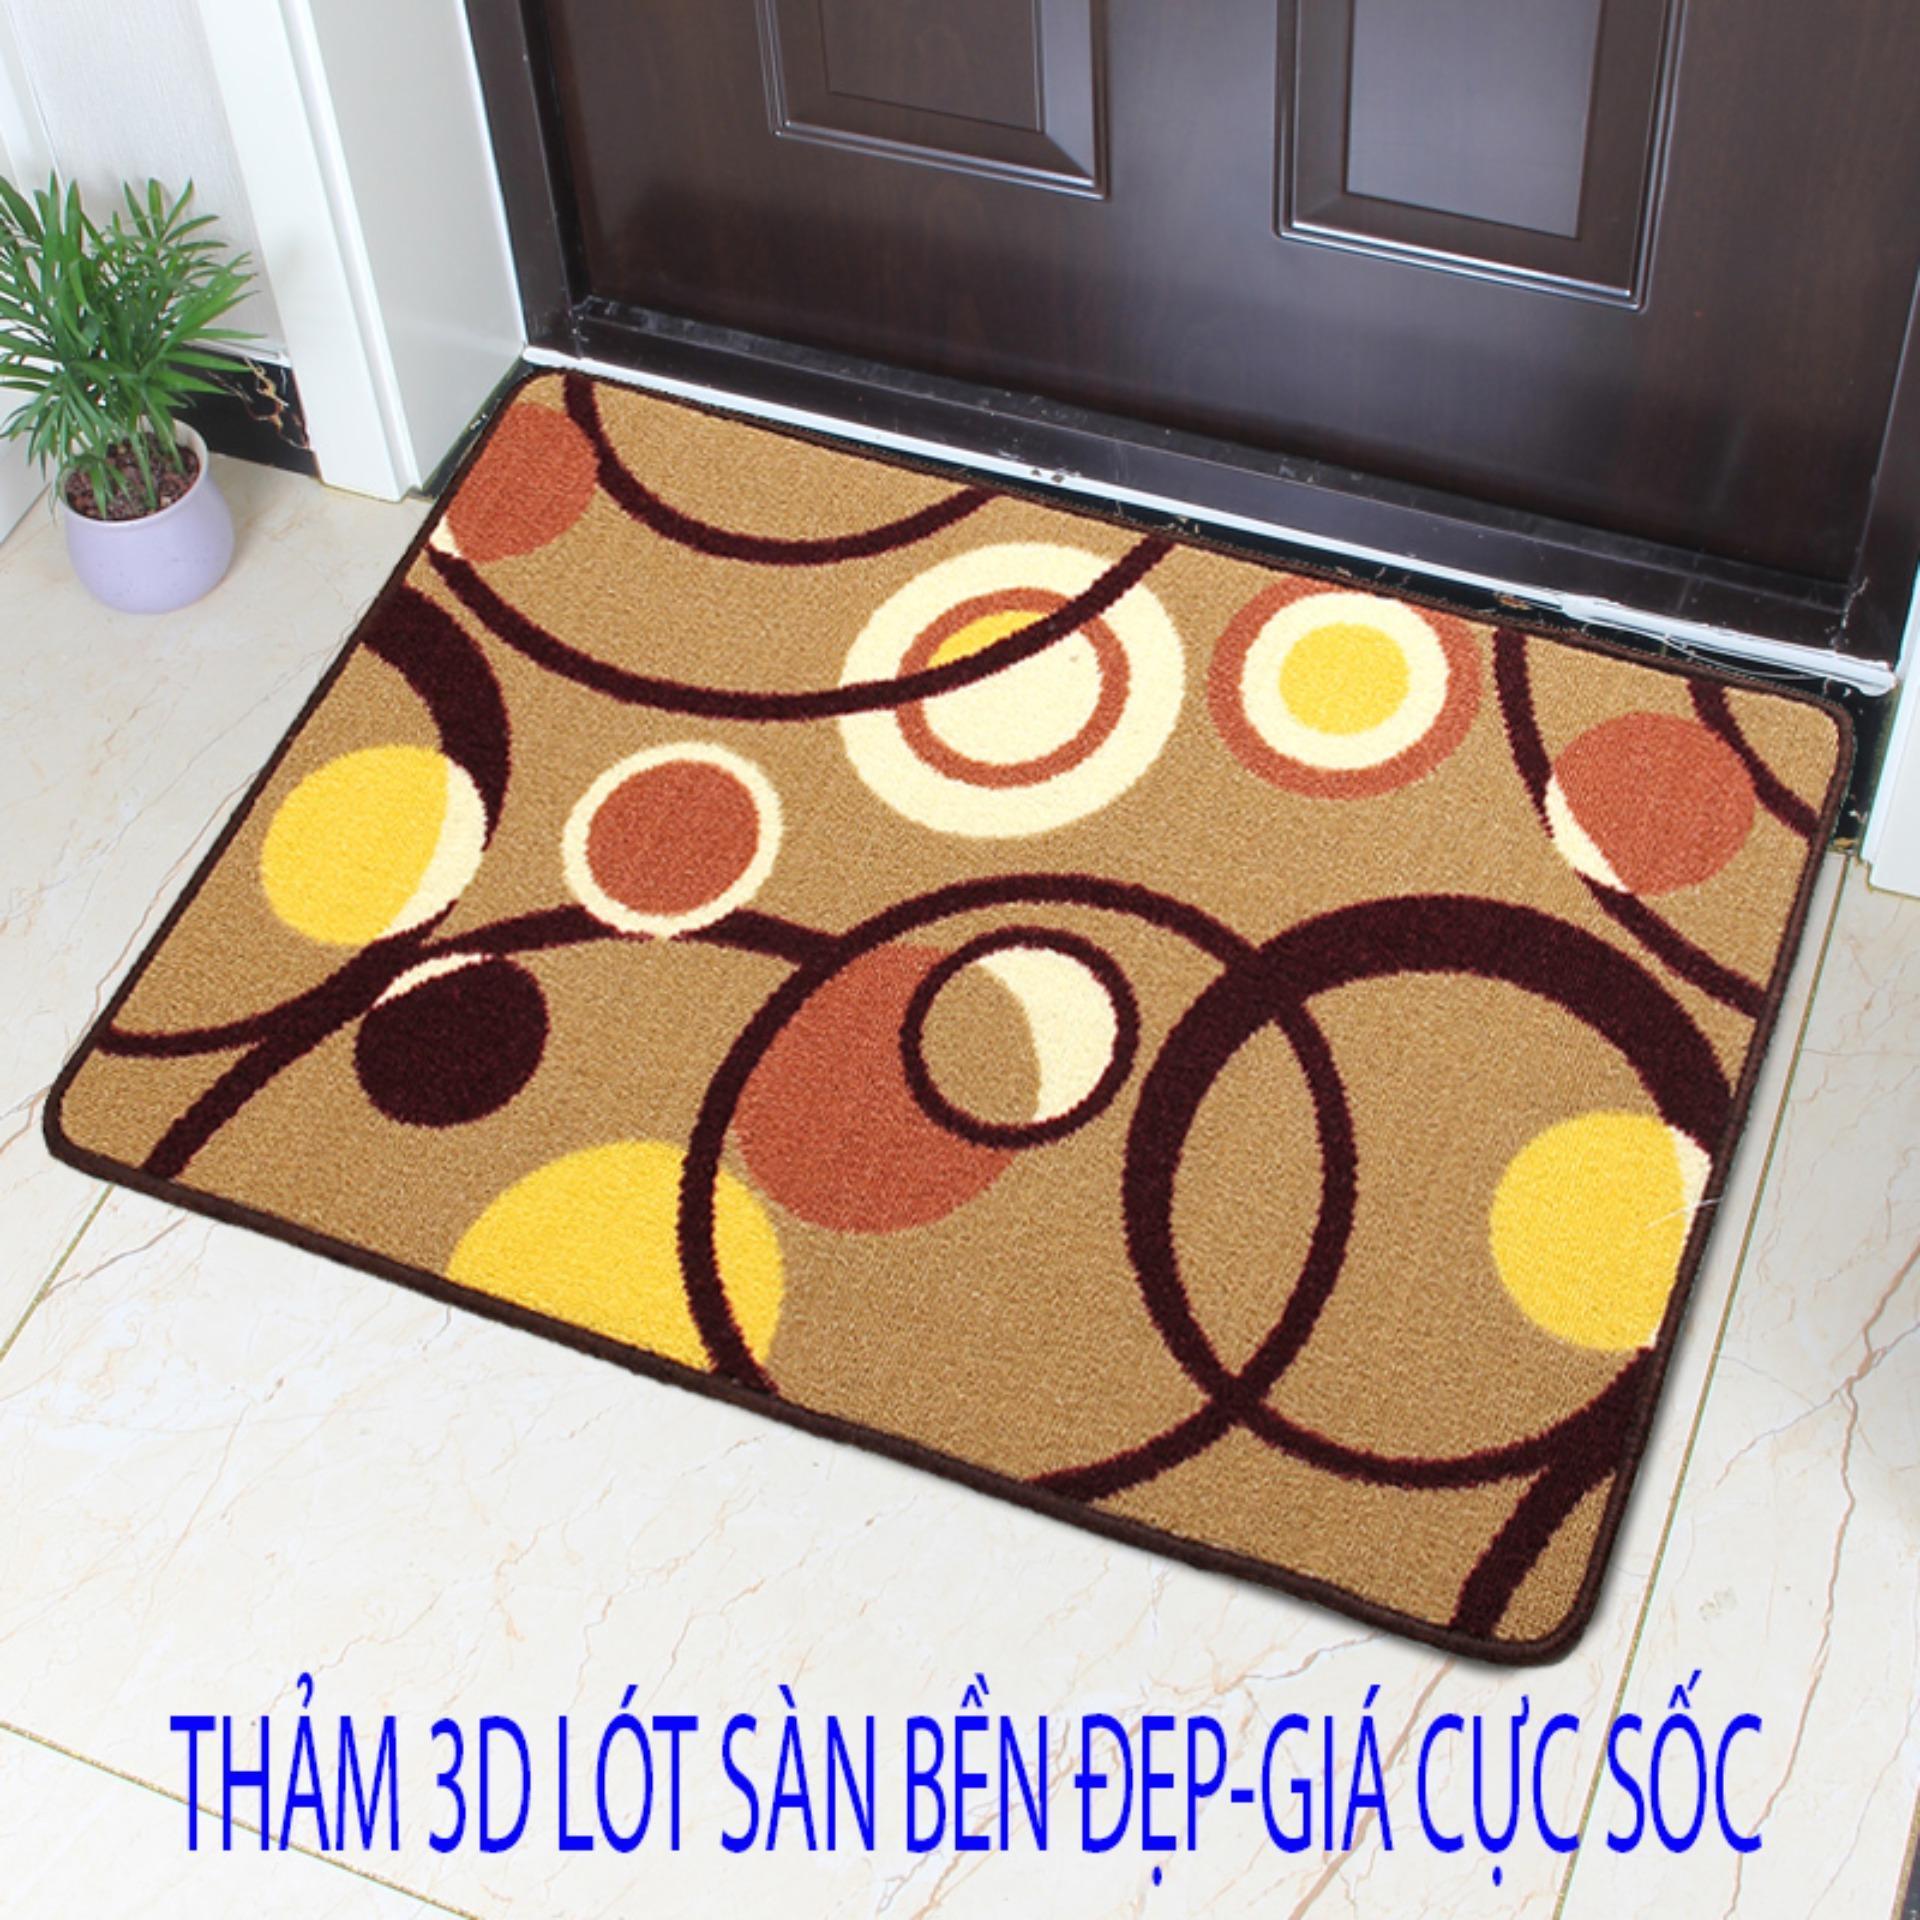 Bộ 2 thảm hoa lau chân 3D (60x40x1.5) khong vien